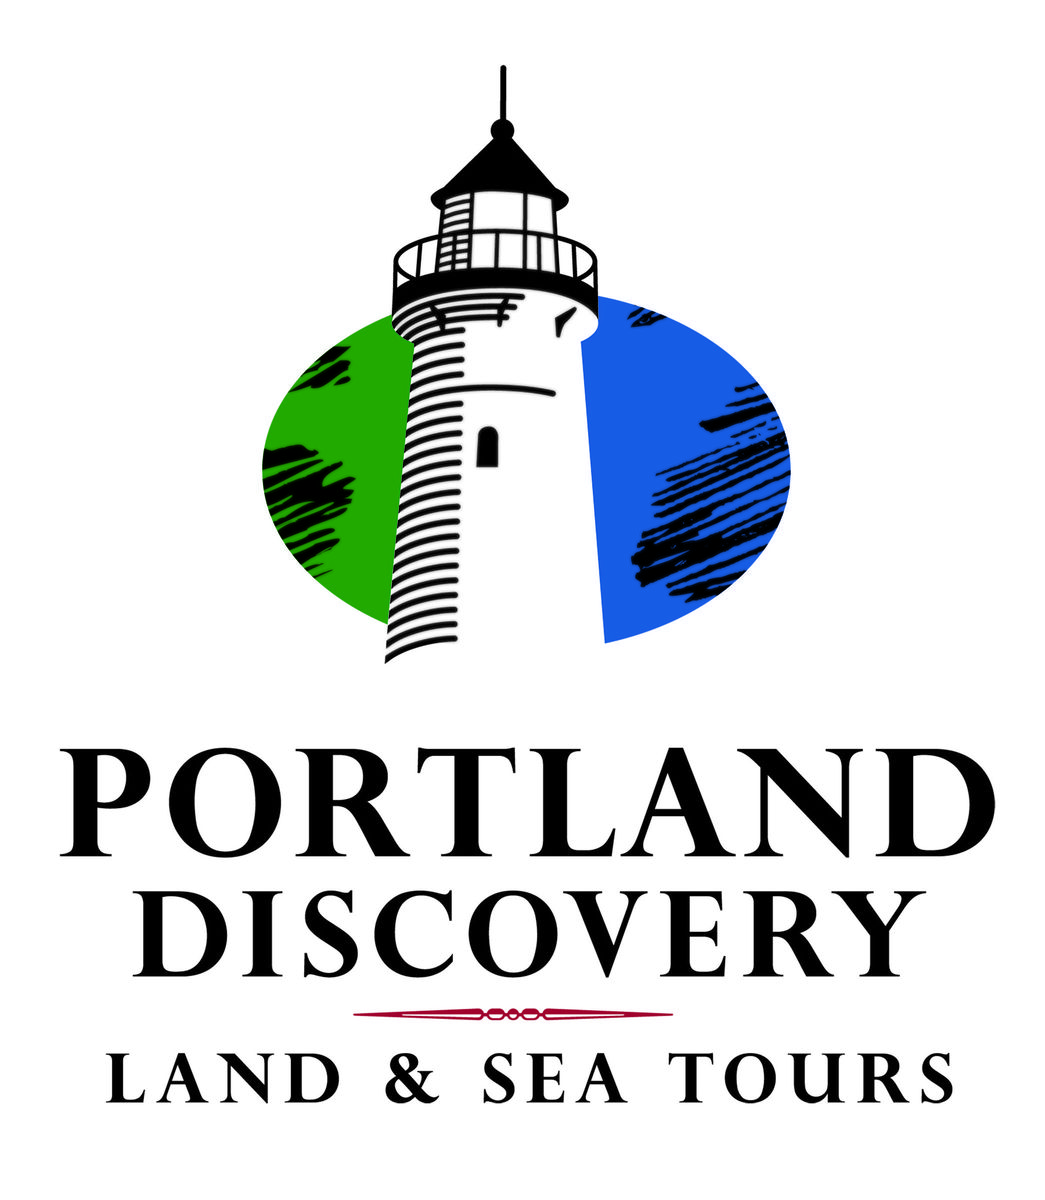 112 Park St Portland Me 04101 Rentals: Portland Discovery Land And Sea Tours Map, Portland